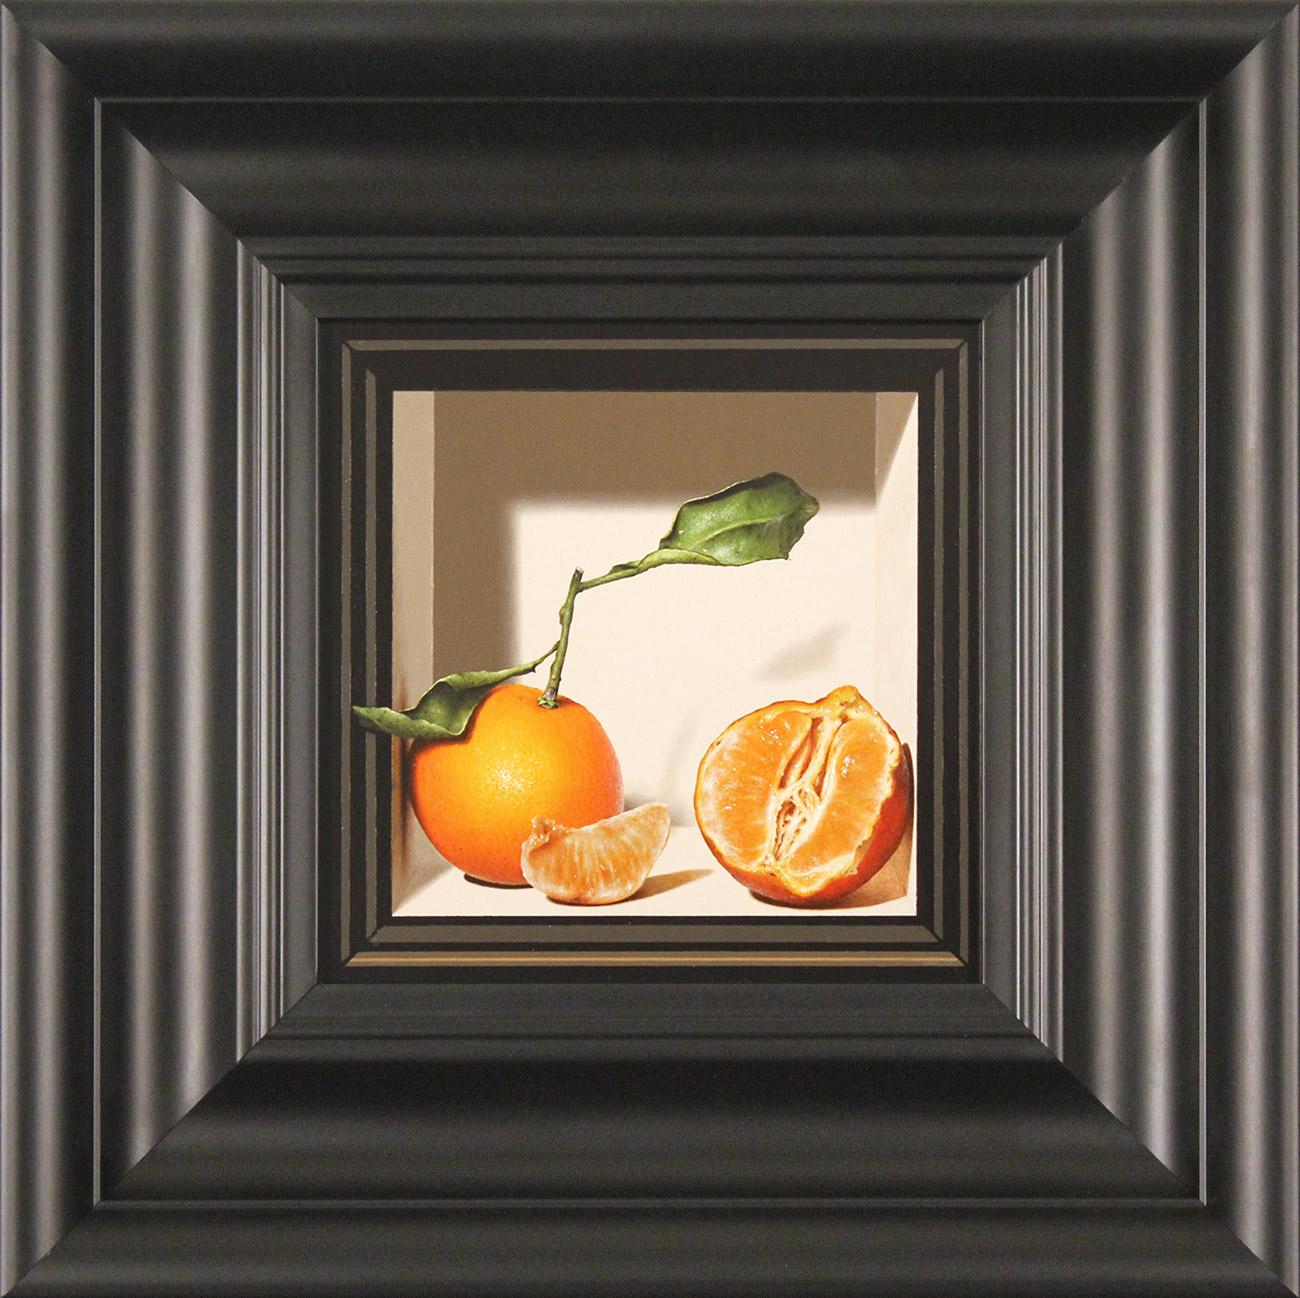 Colin Wilson, Original acrylic painting on board, Sicilian Oranges  Click to enlarge